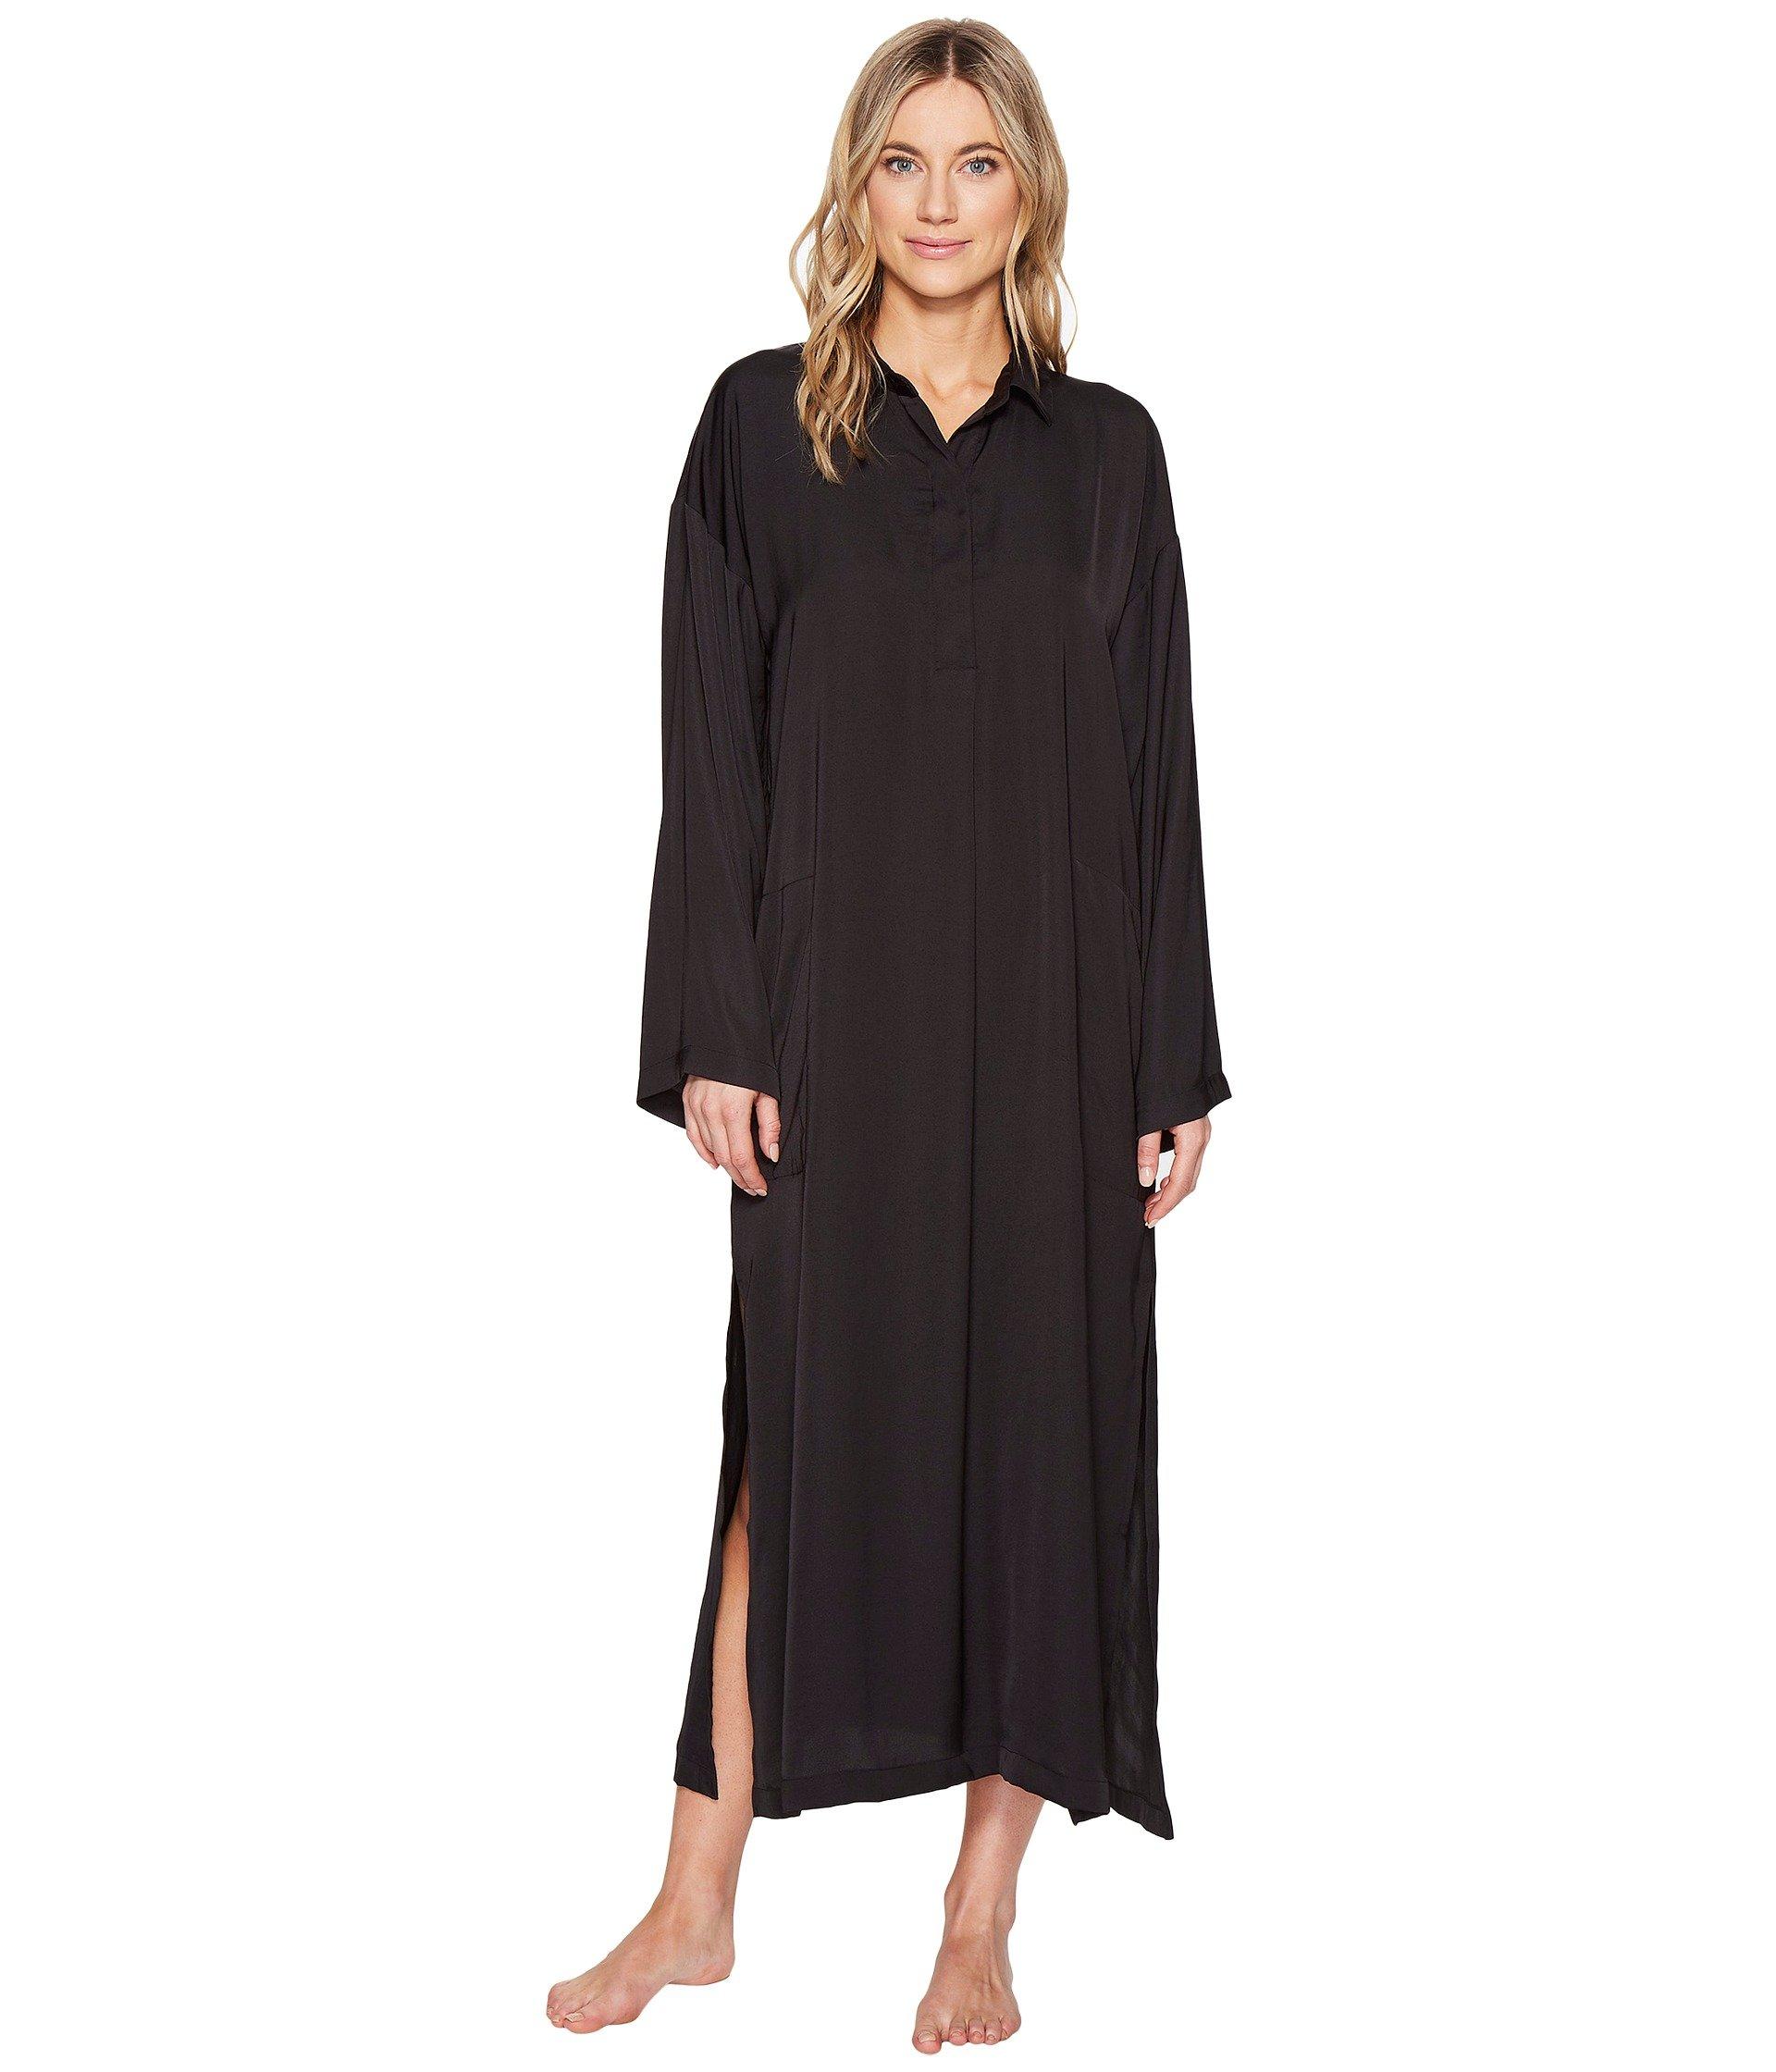 Babydoll DKNY Fashion Long Sleeve Maxi Sleepshirt  + DKNY en VeoyCompro.net